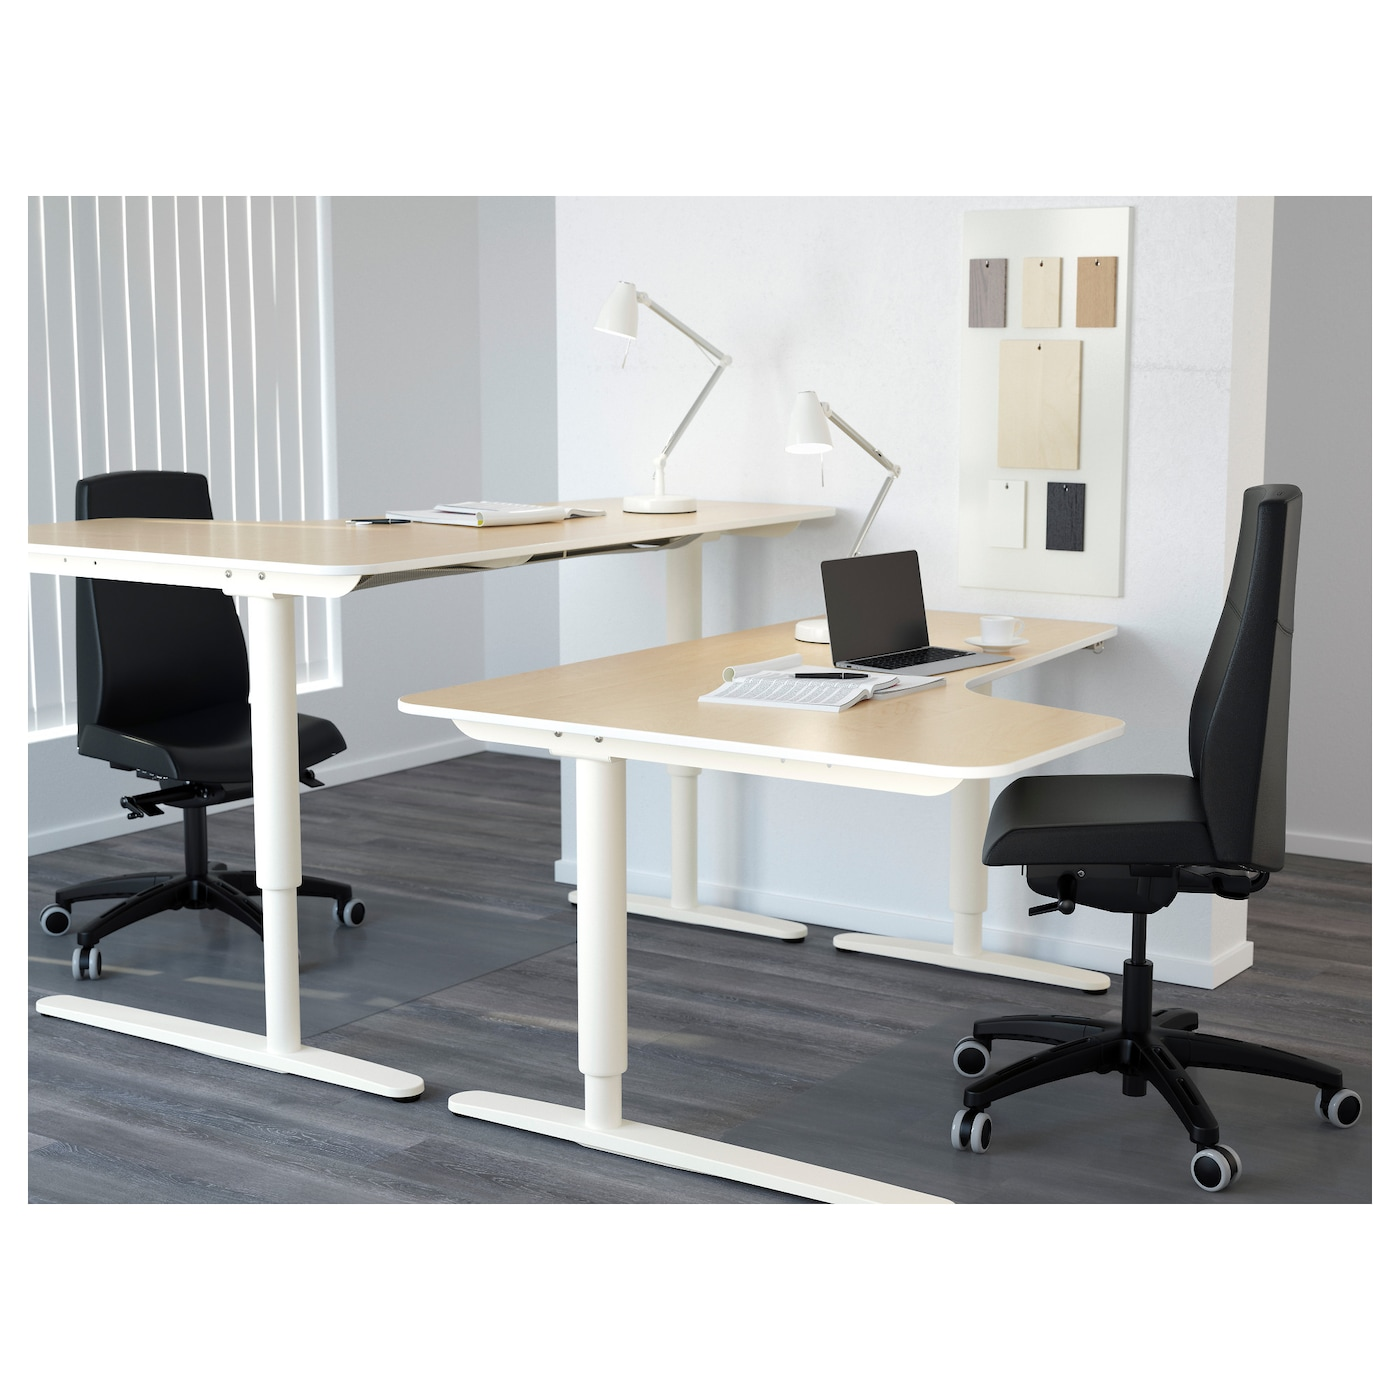 bekant corner desk right sit stand birch veneer white 160x110 cm ikea. Black Bedroom Furniture Sets. Home Design Ideas